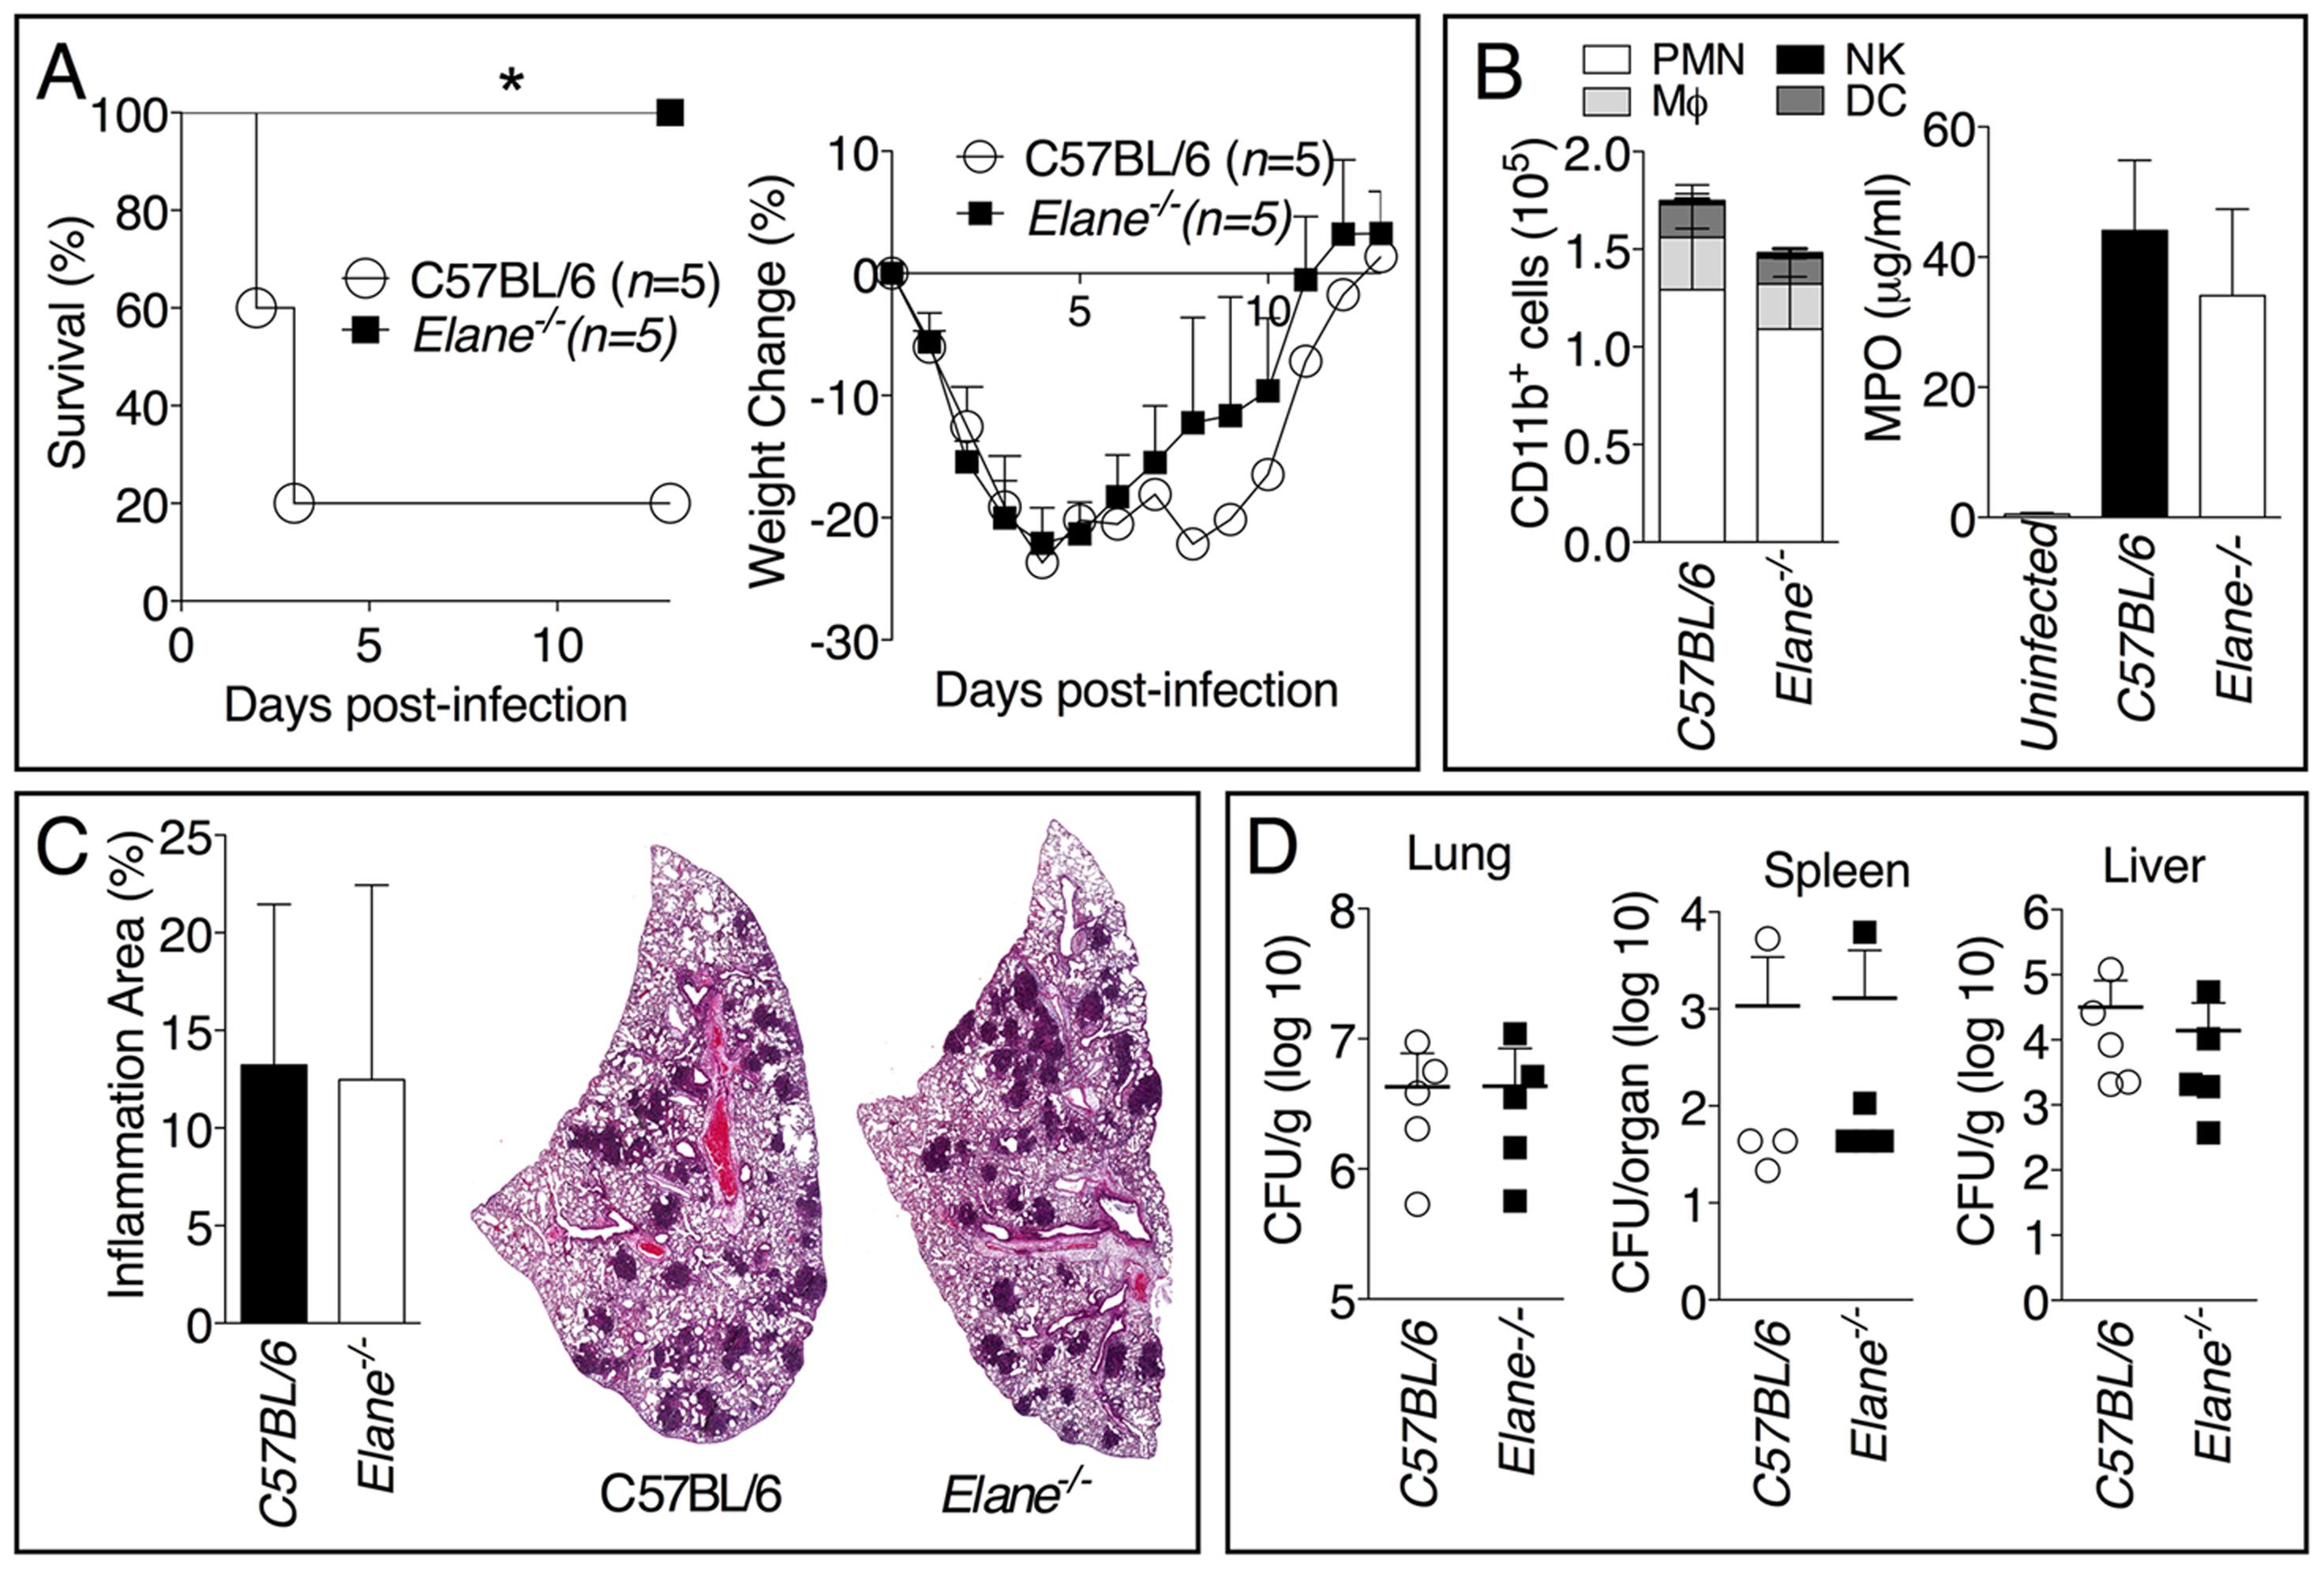 Neutrophil elastase reduces host tolerance to infection with <i>B. pseudomallei</i>.